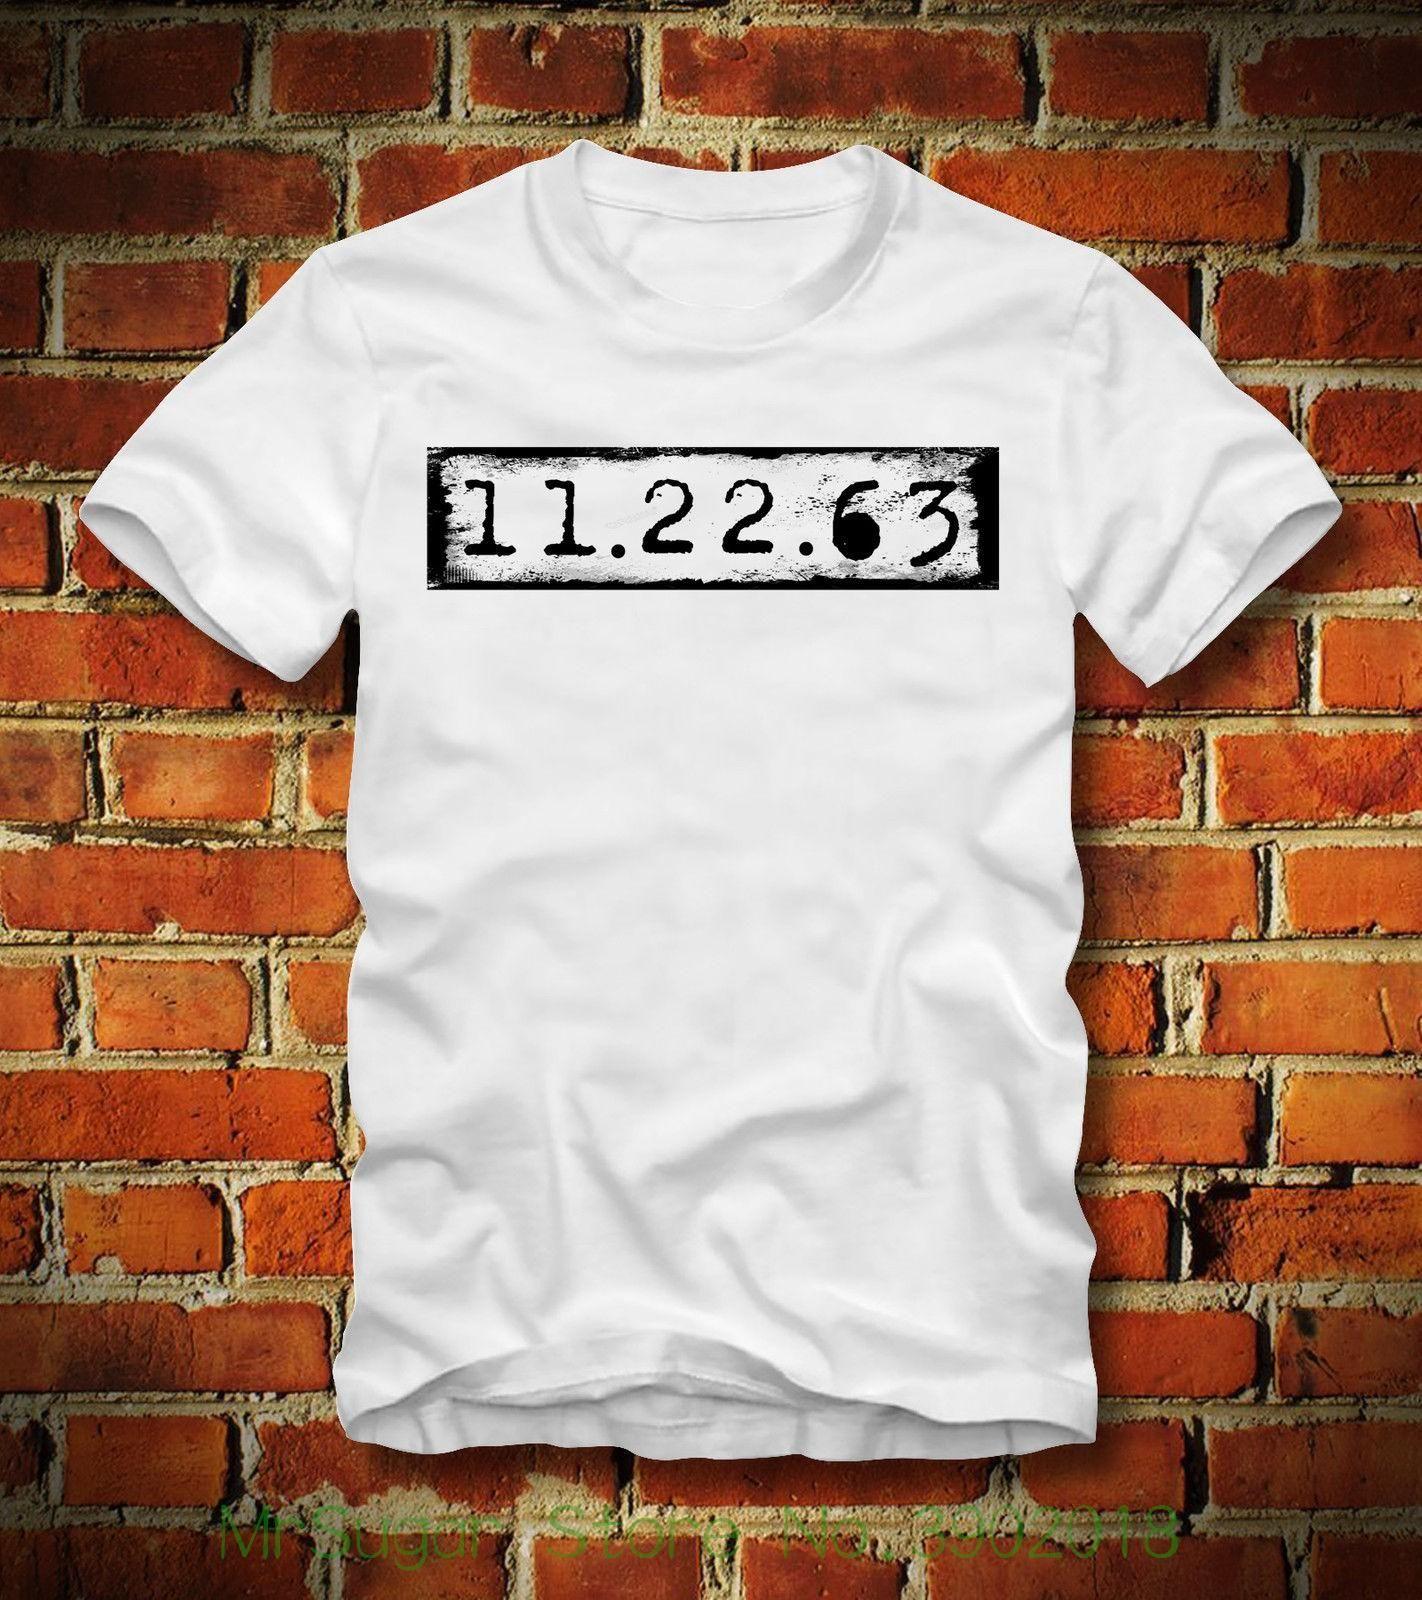 ff307607fce7 Boardrippaz T Shirt 11.22.63 Der Anschlag Stephen King Jfk John F Kennedy  Oswald Short Sleeve Summer Style Humorous T Shirts T Shirts Funny From  Jie030